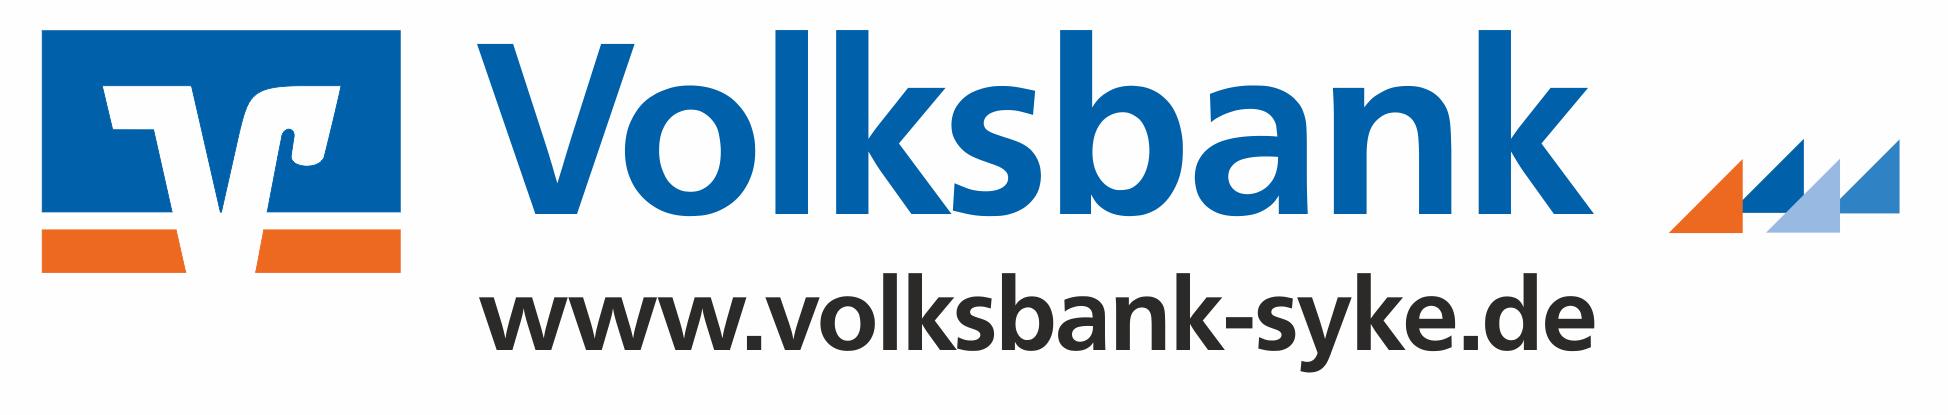 Volksbank Syke